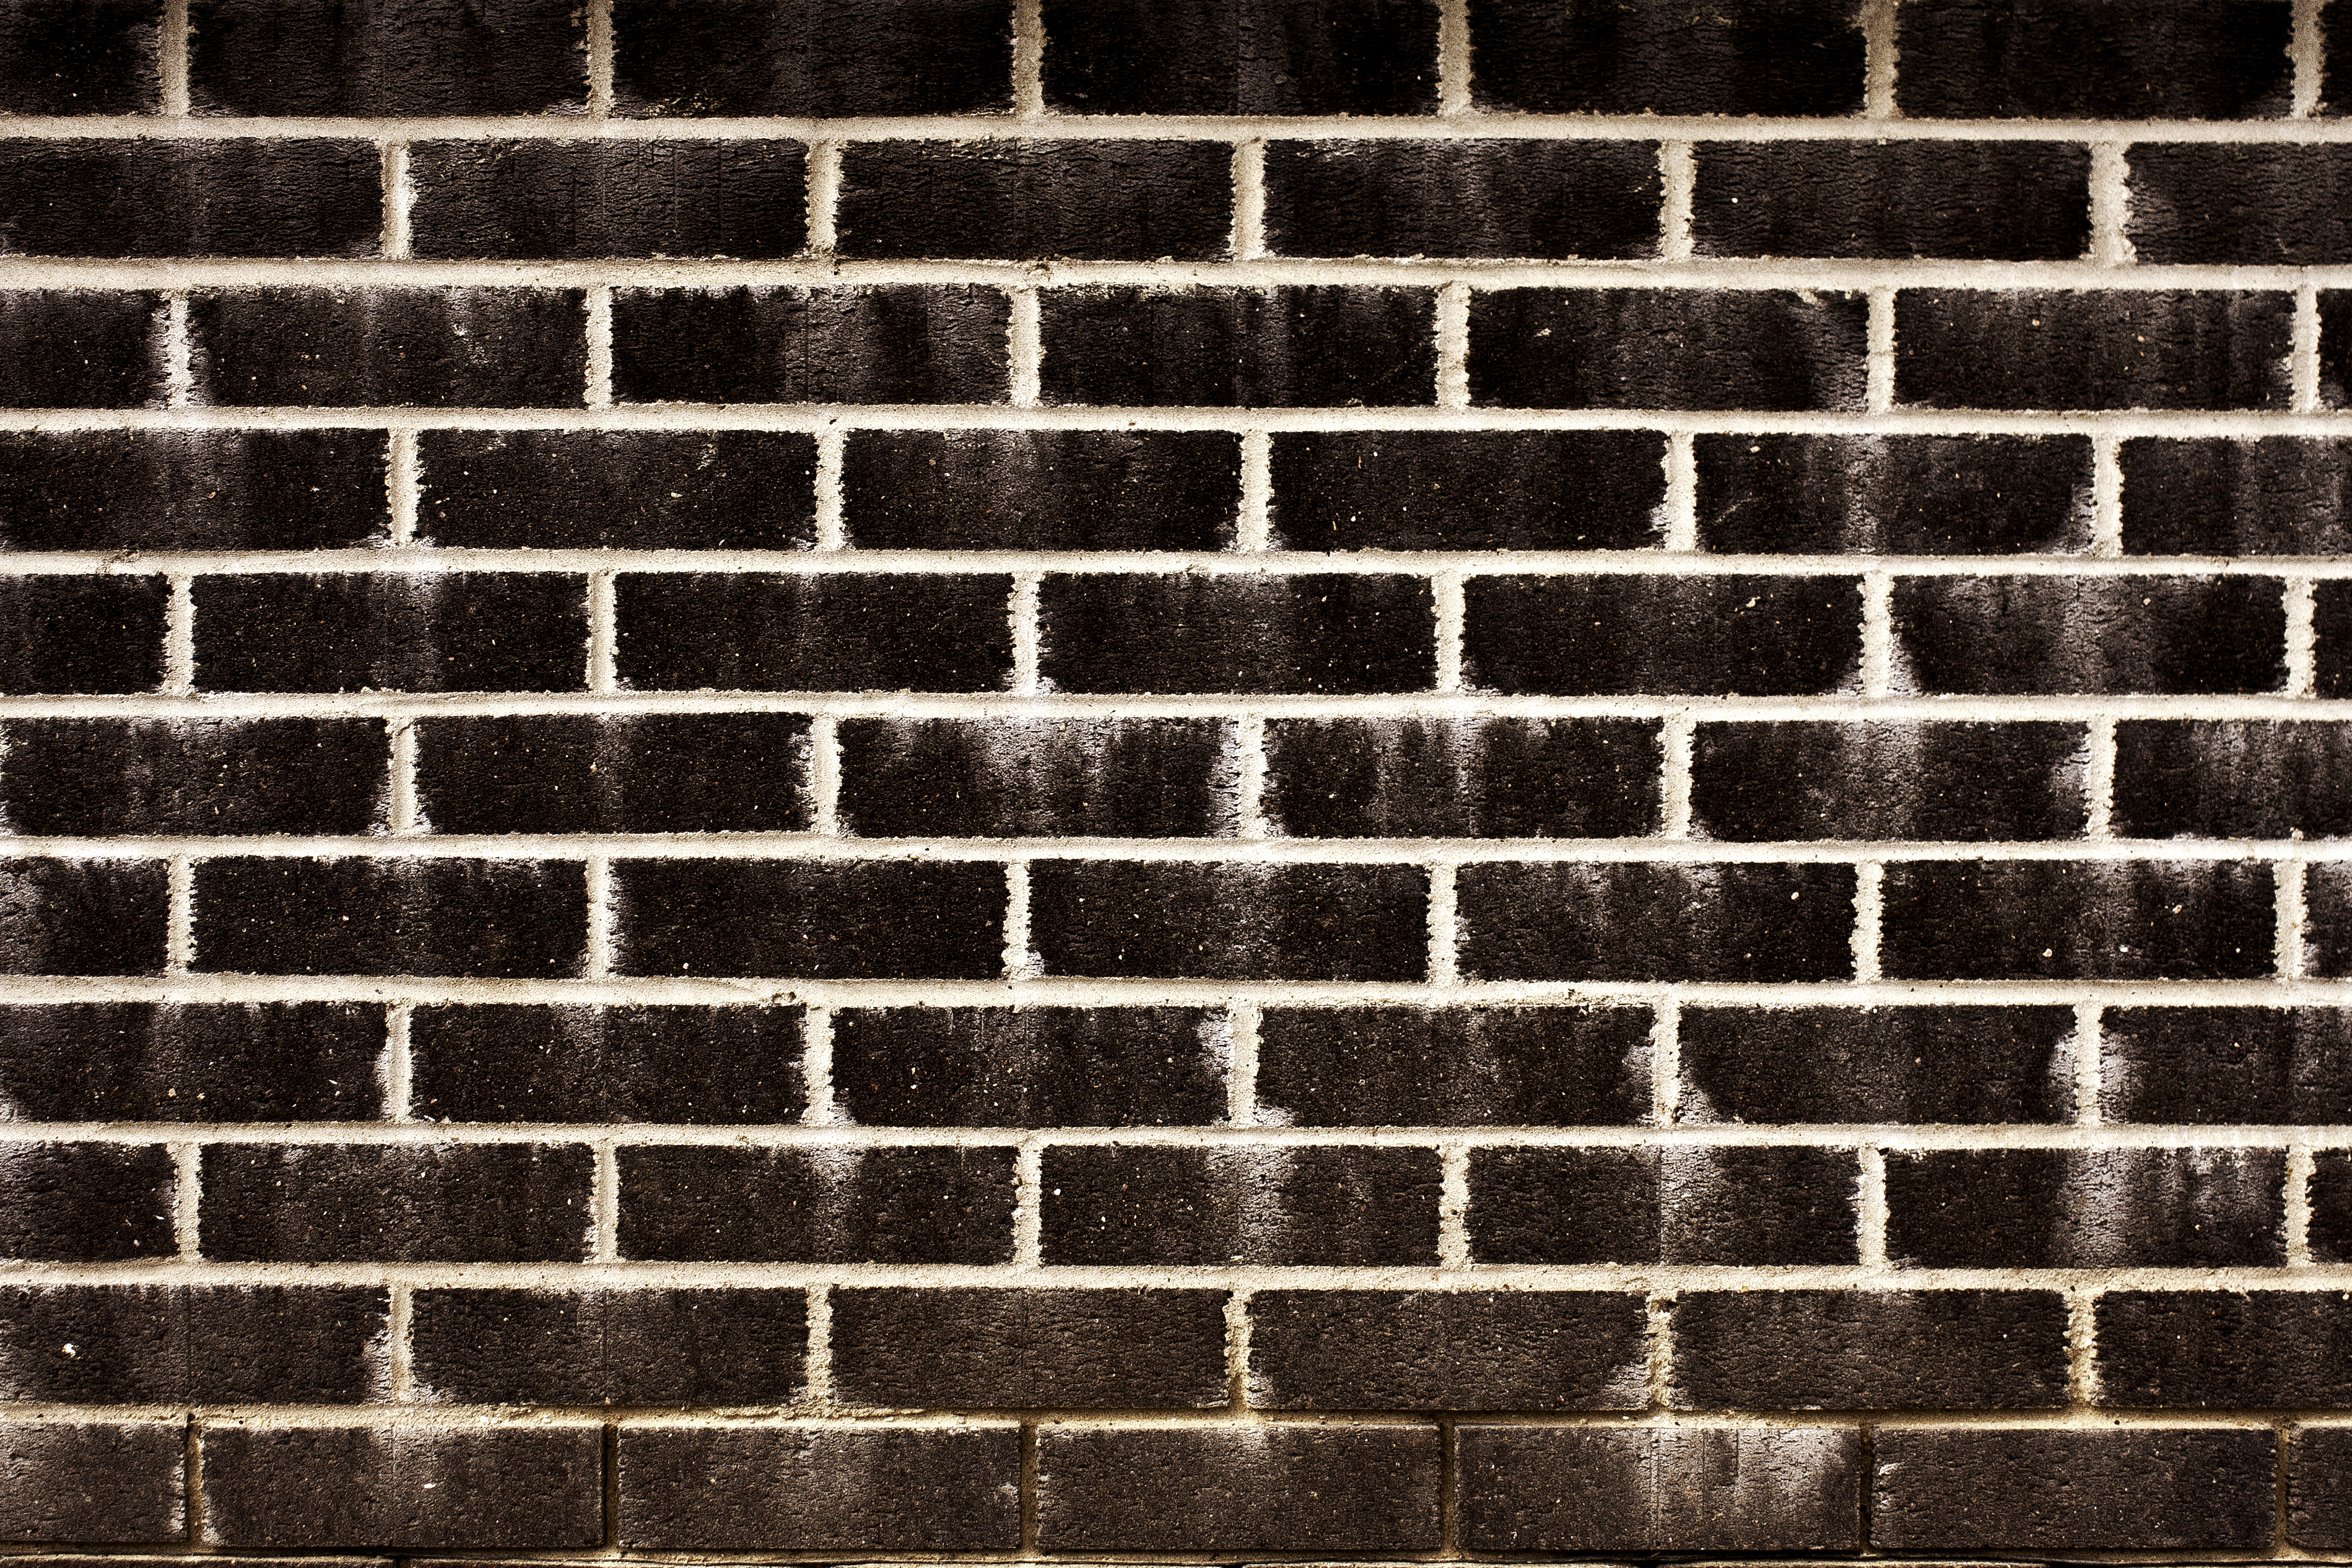 Brick Texture by Nick356